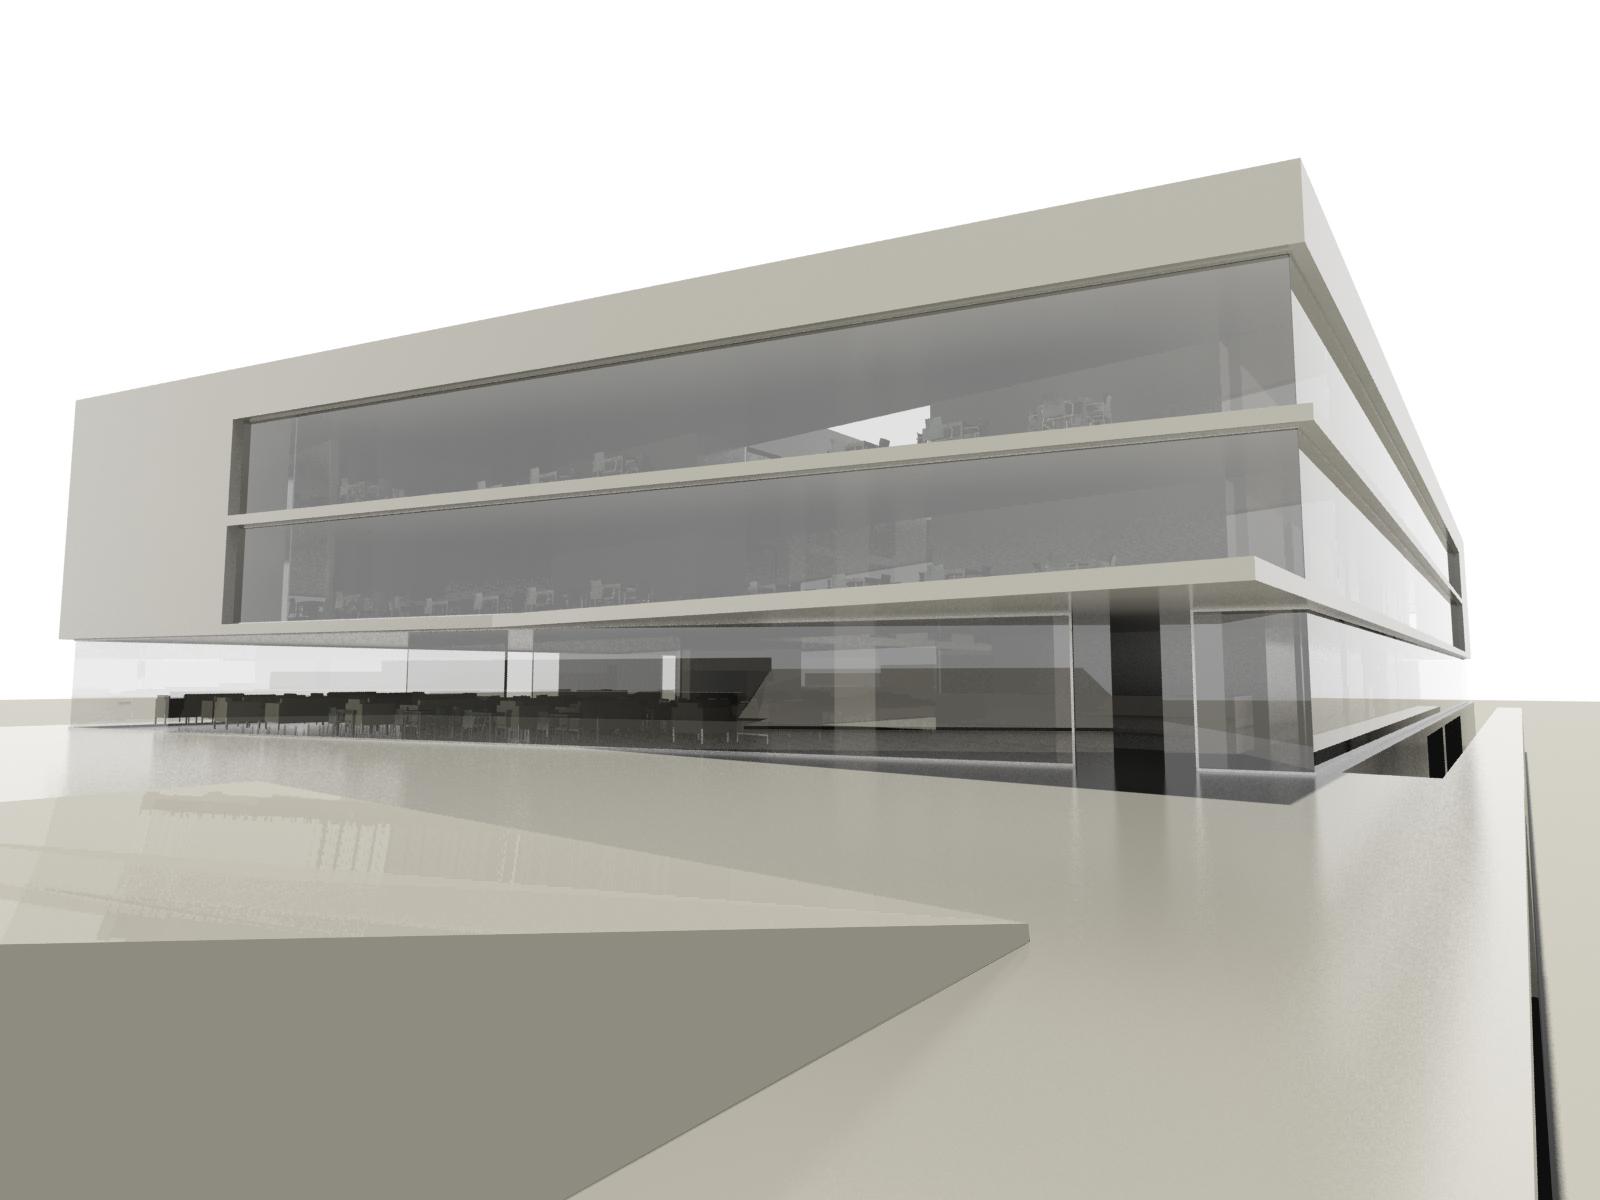 Residencia geriátrica en Reus - Tarragona - Arquitecto Especializado en Geriátricos - Arquitectura Geriátrica